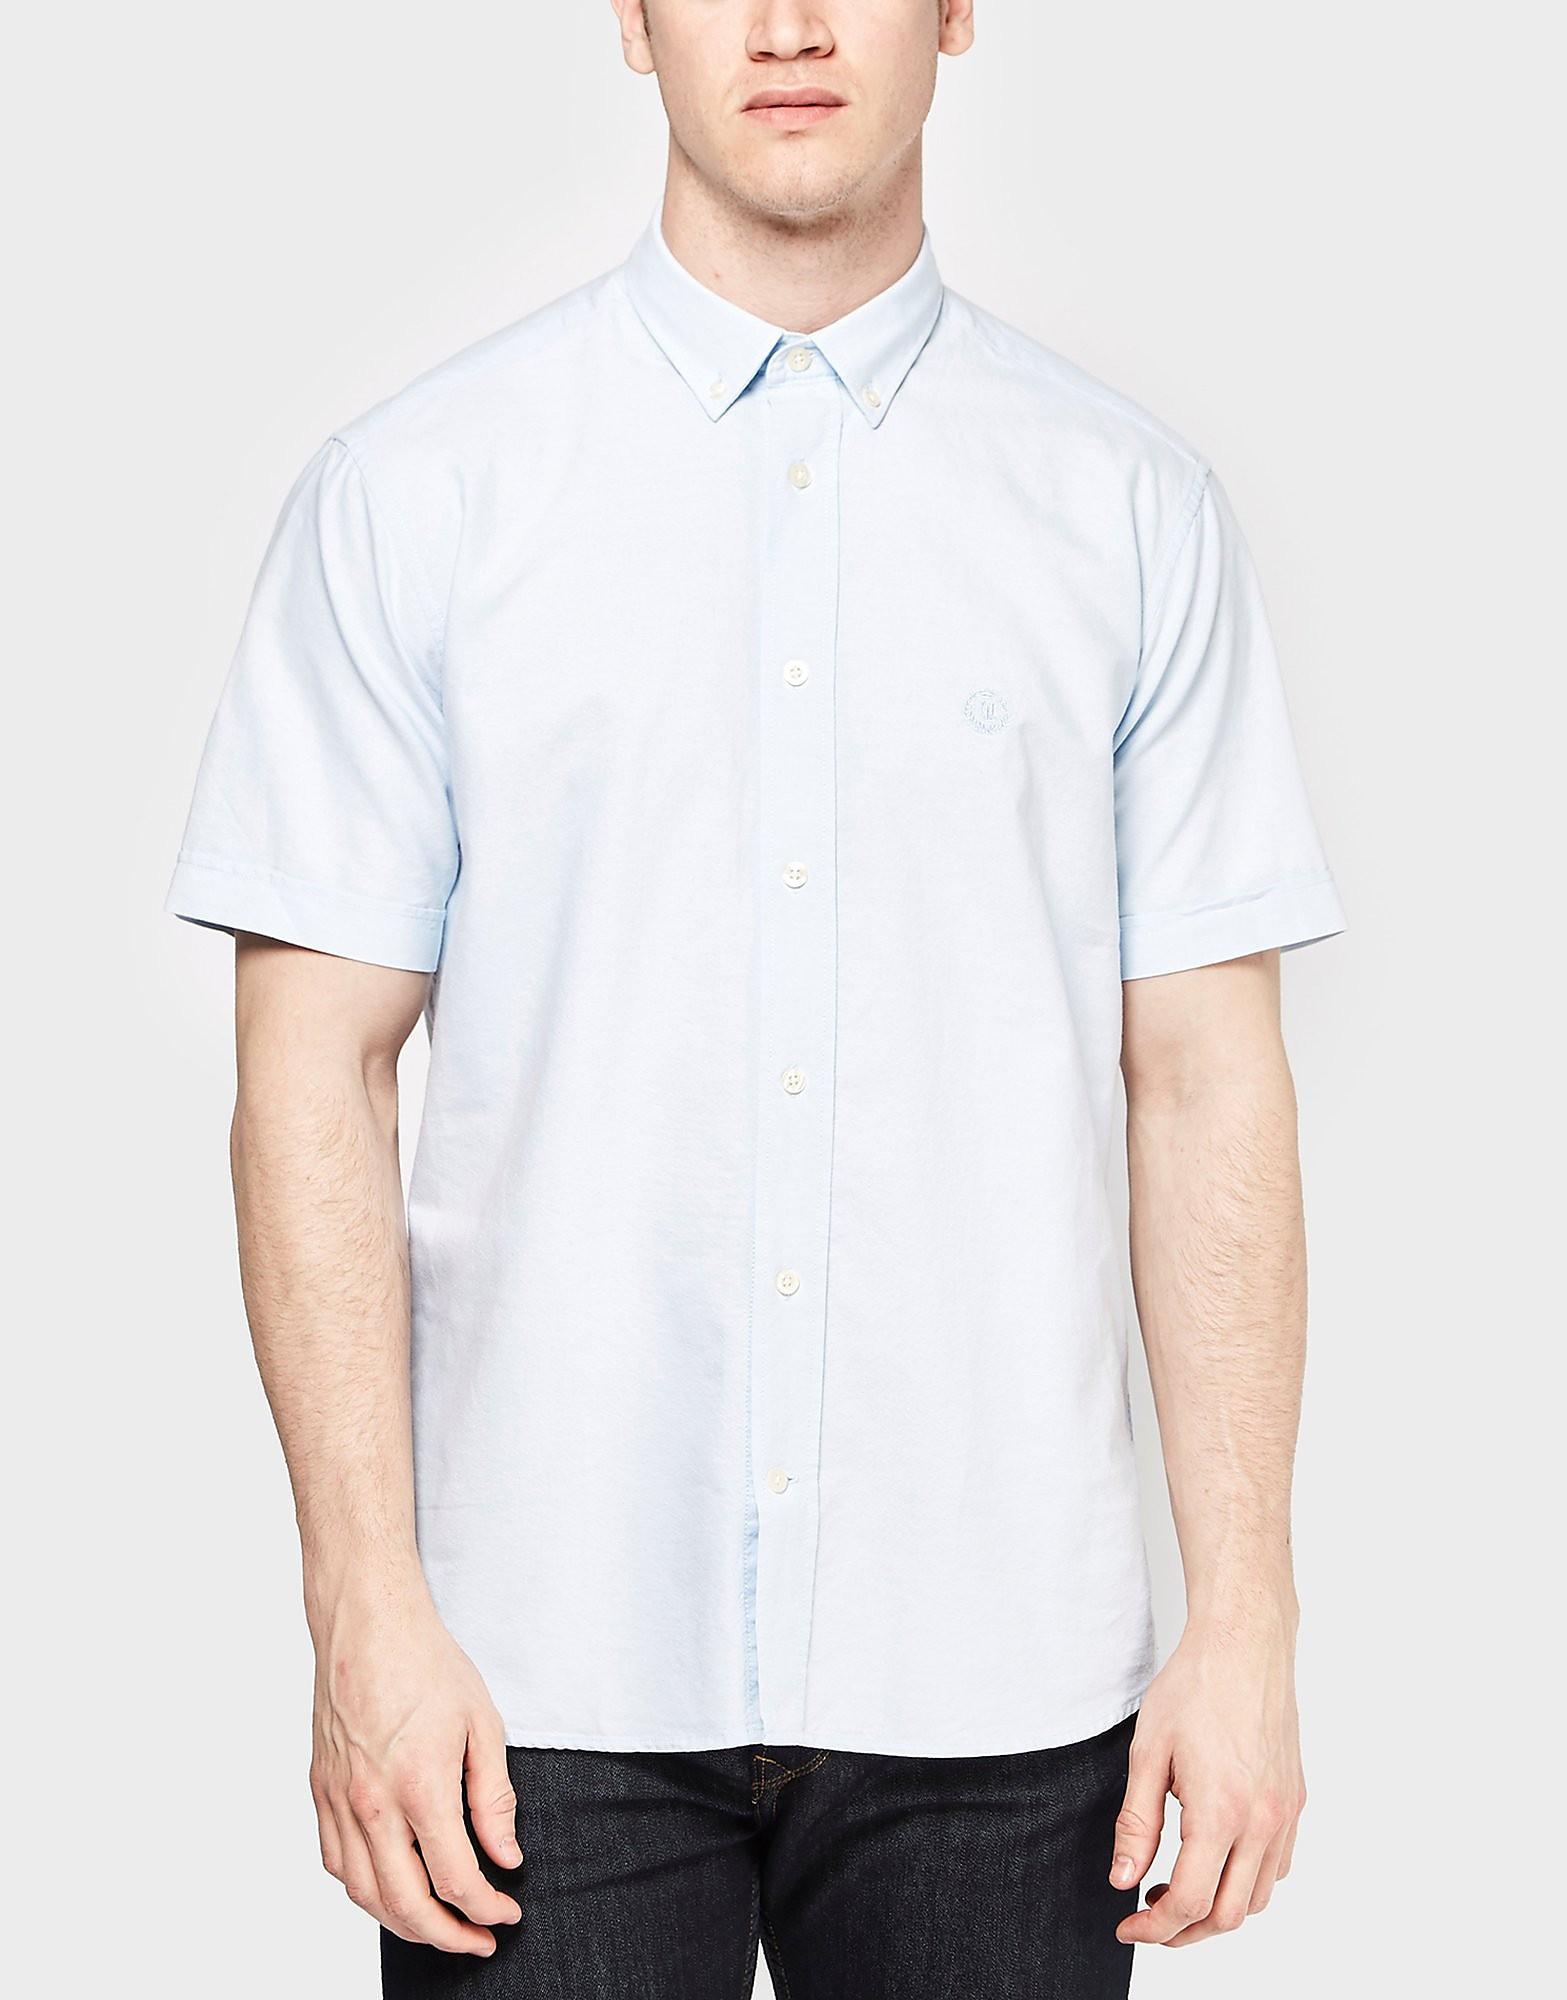 Henri Lloyd Short Sleeve Oxford Shirt  Sky Sky